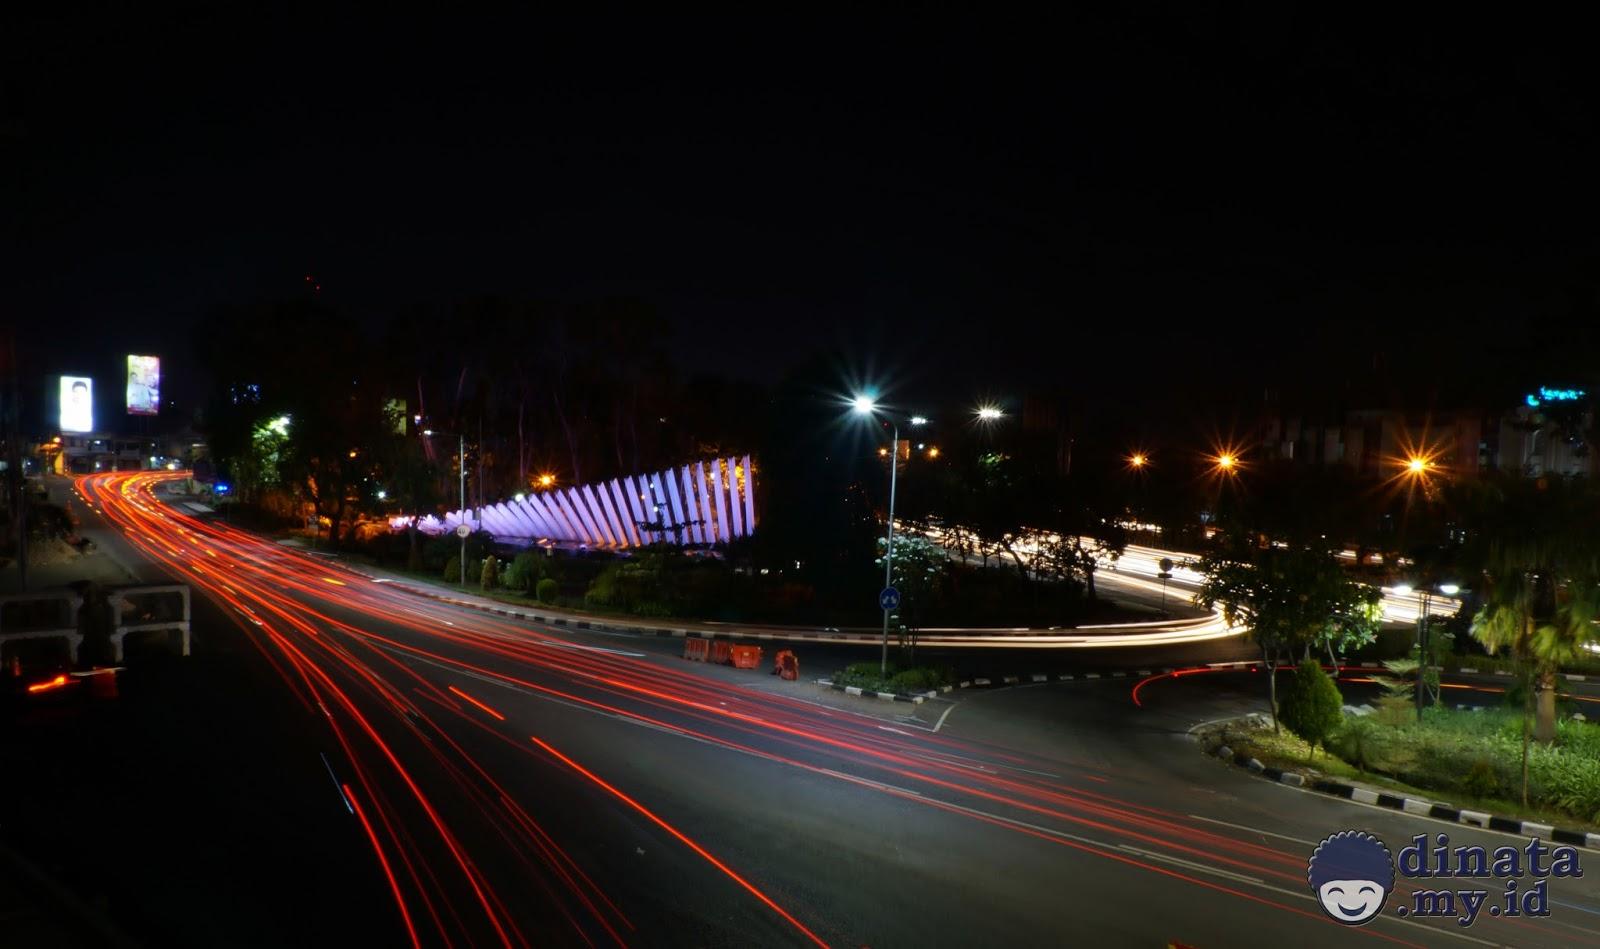 Taman Pelangi Surabaya Penyambut Perbatasan Dinata Kota